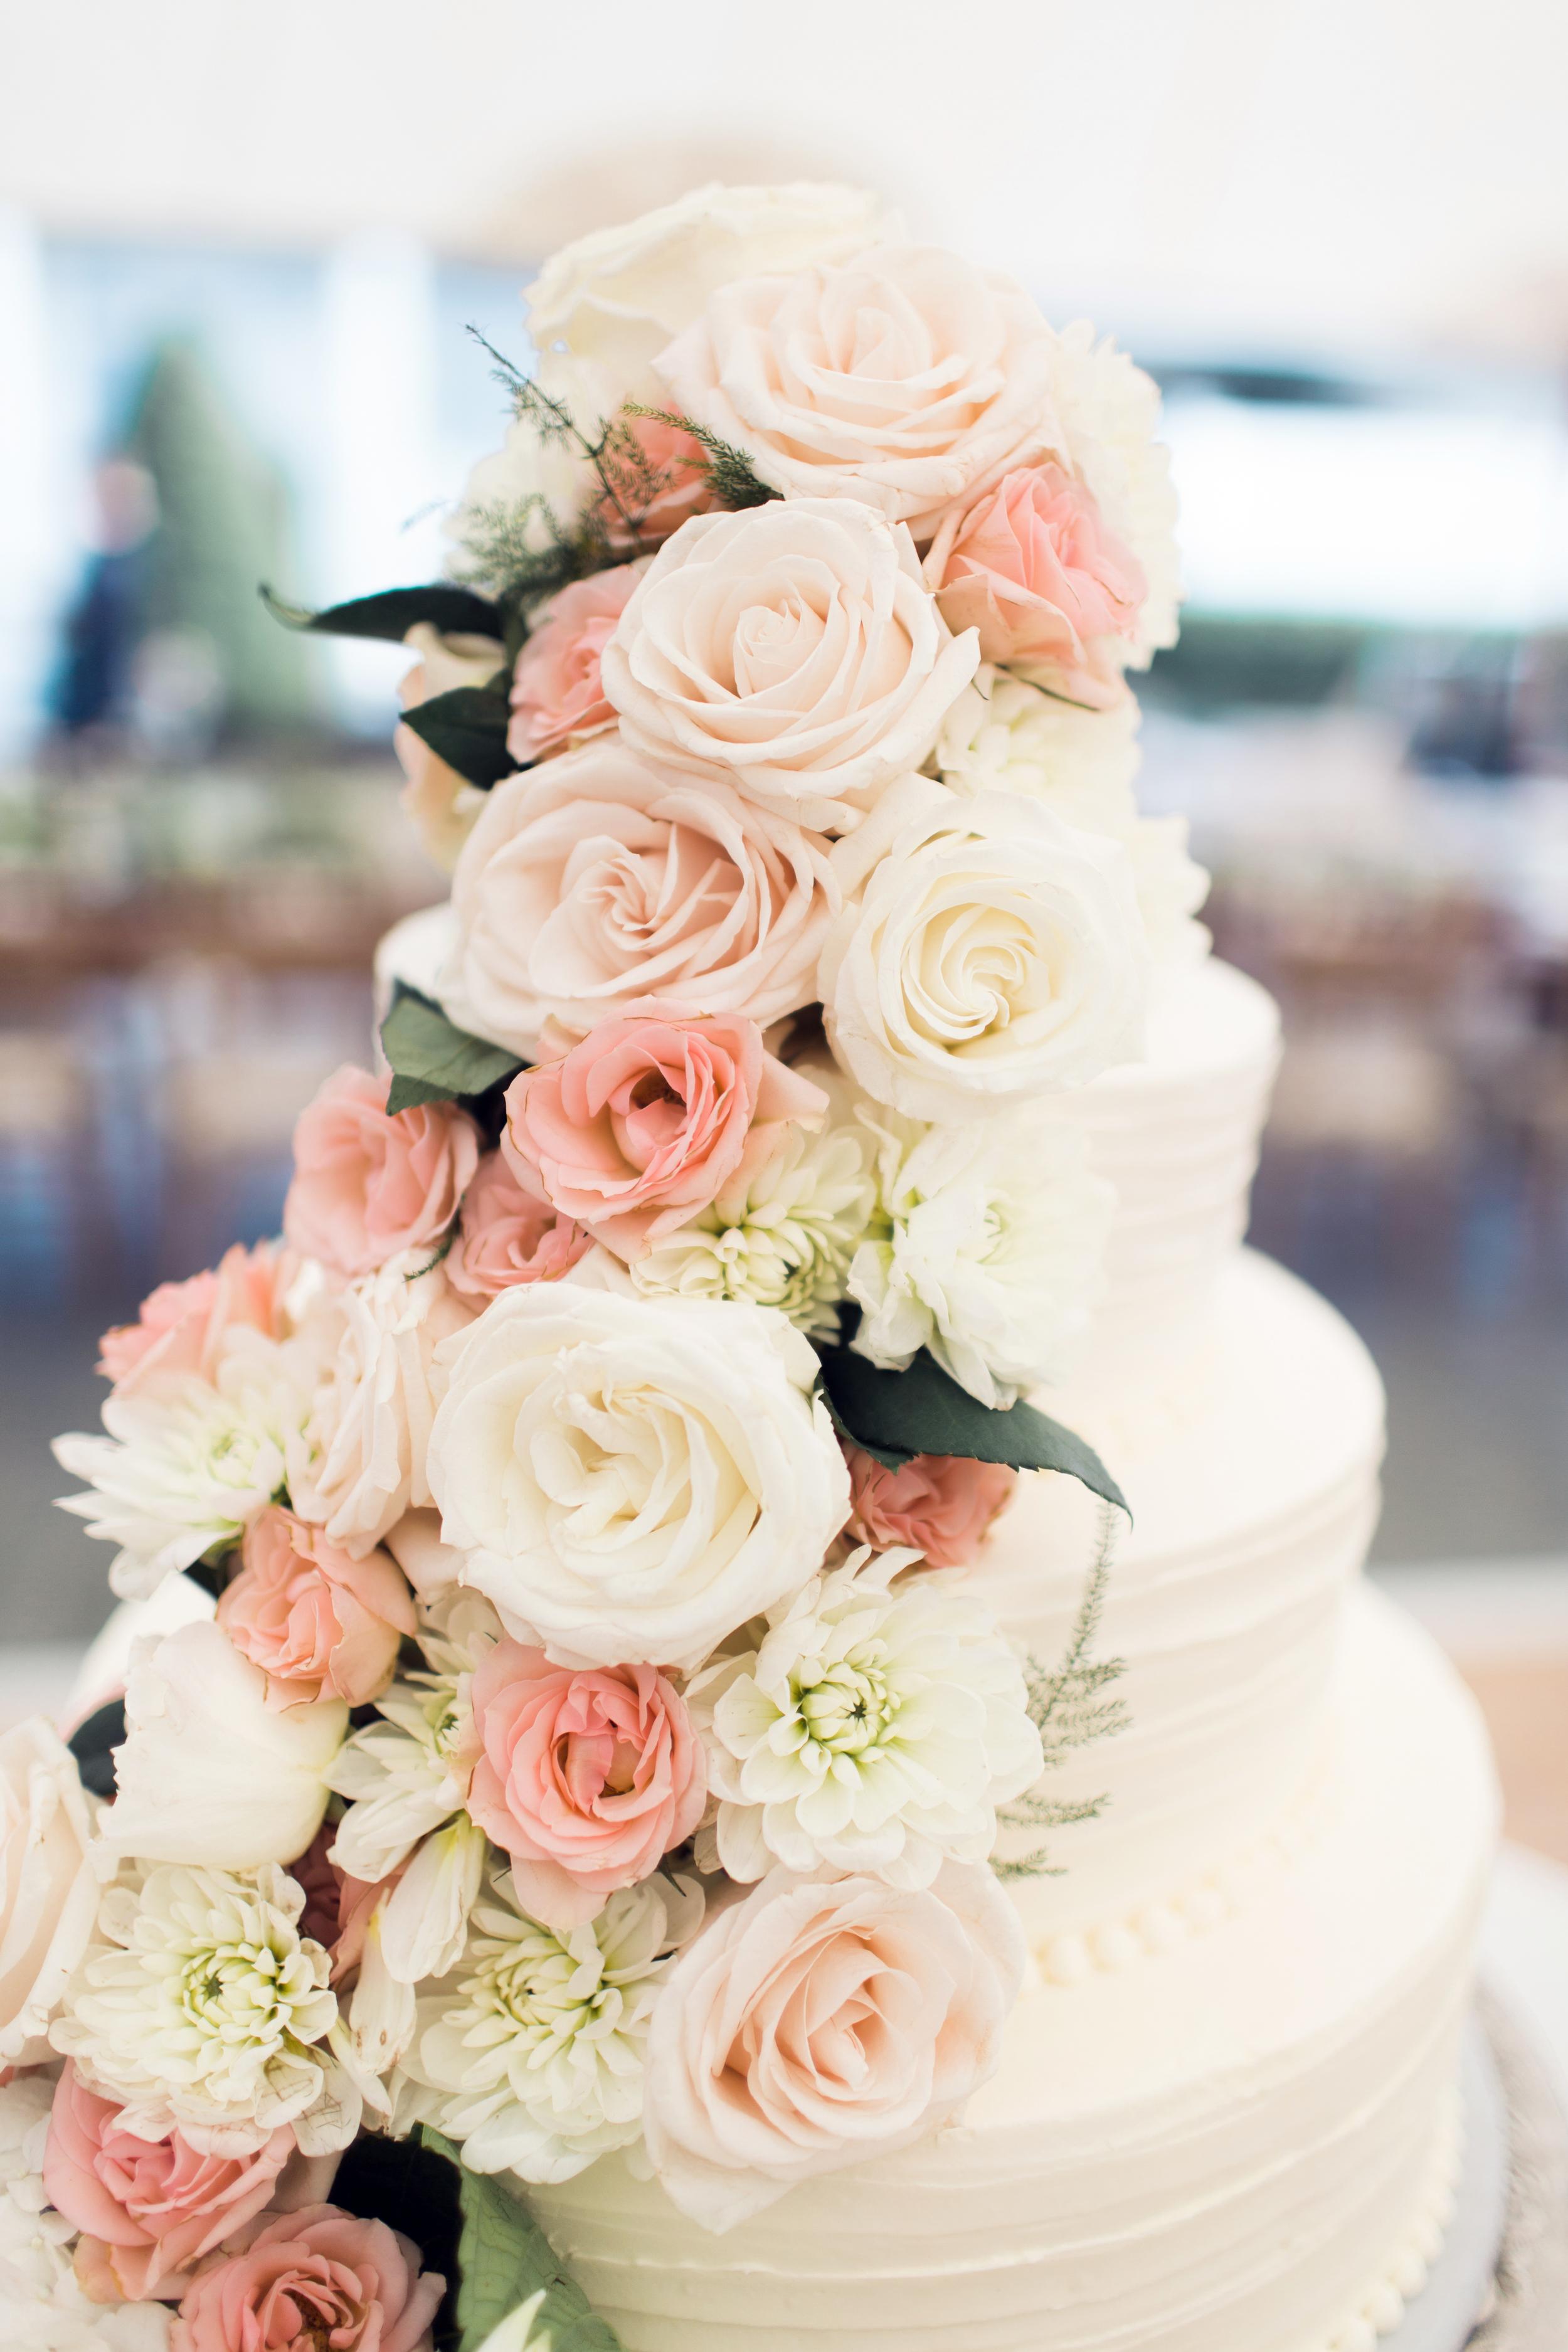 FlowerKiosk_WeddingLookbook_009.jpg